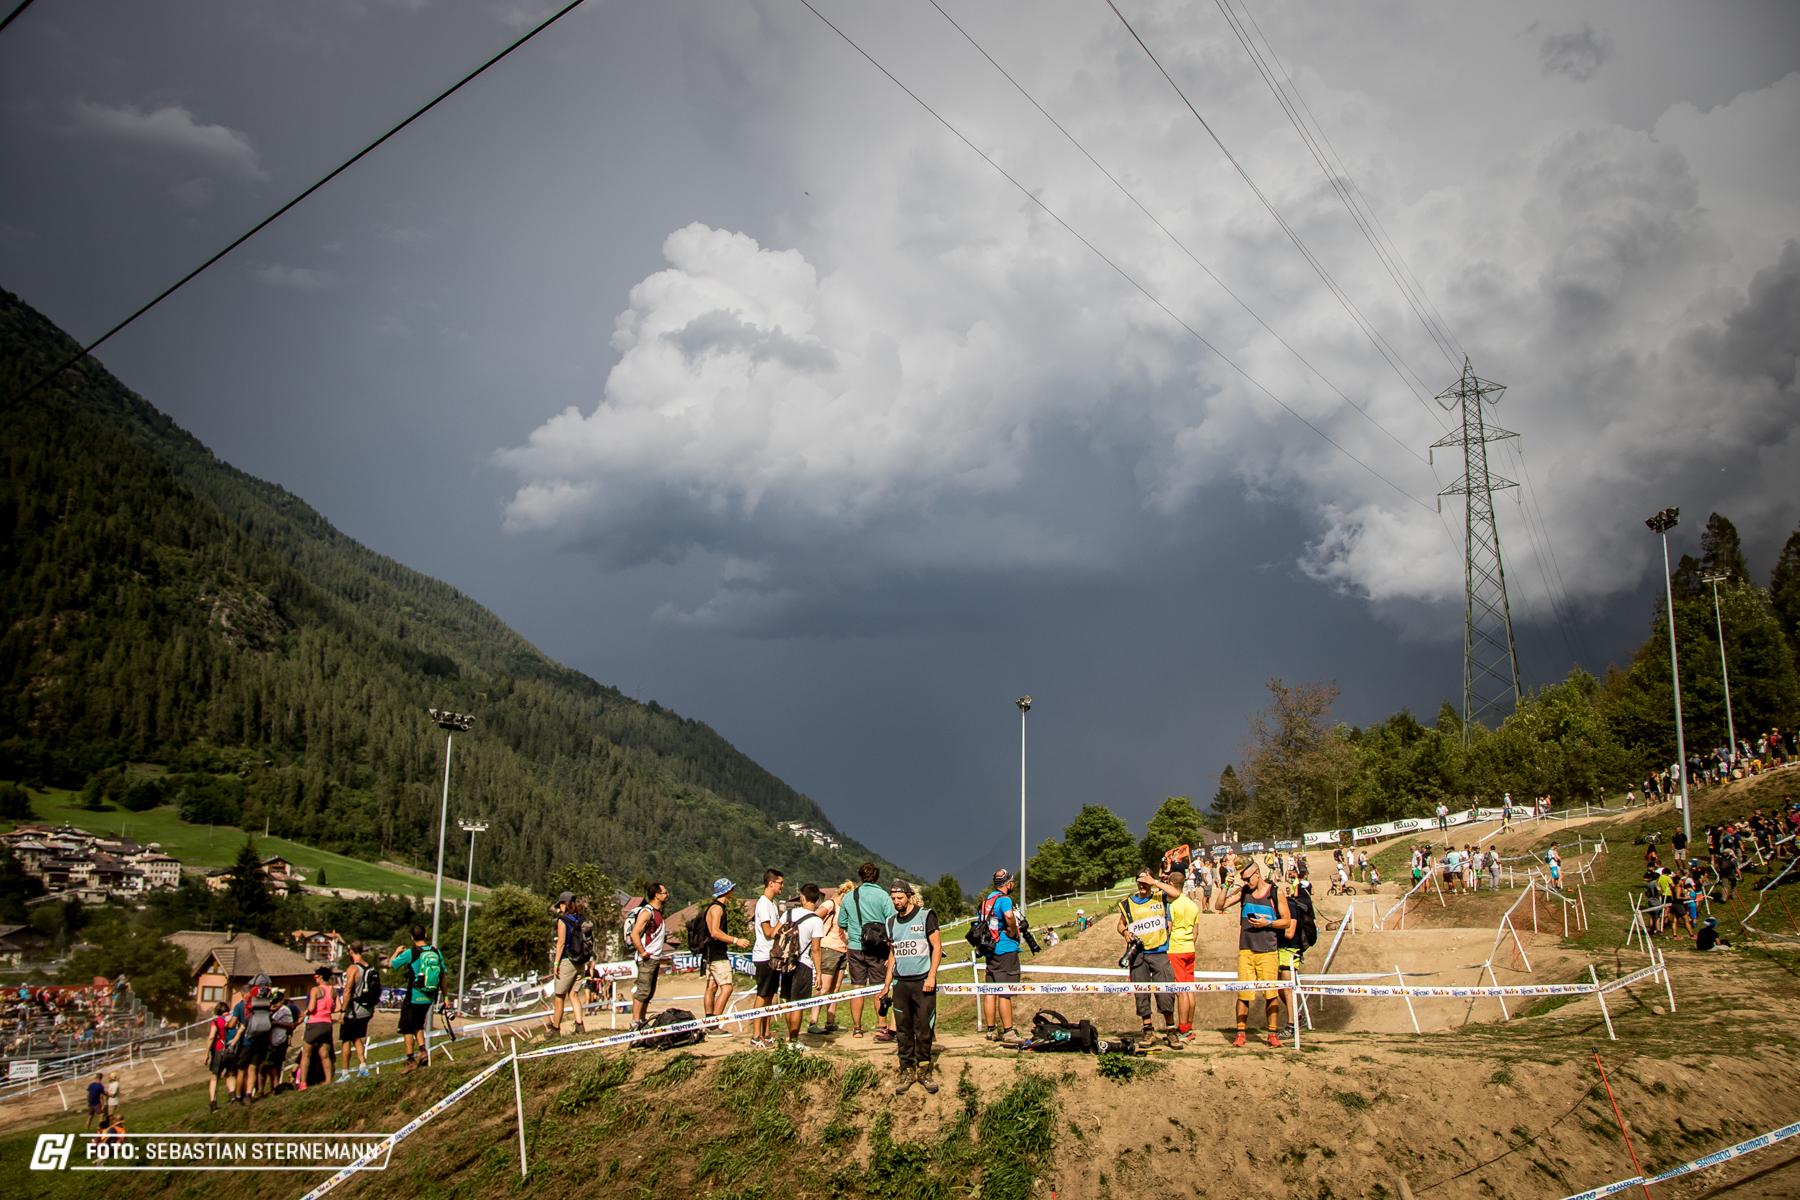 Saturday Val di Sole151 Cycleholix